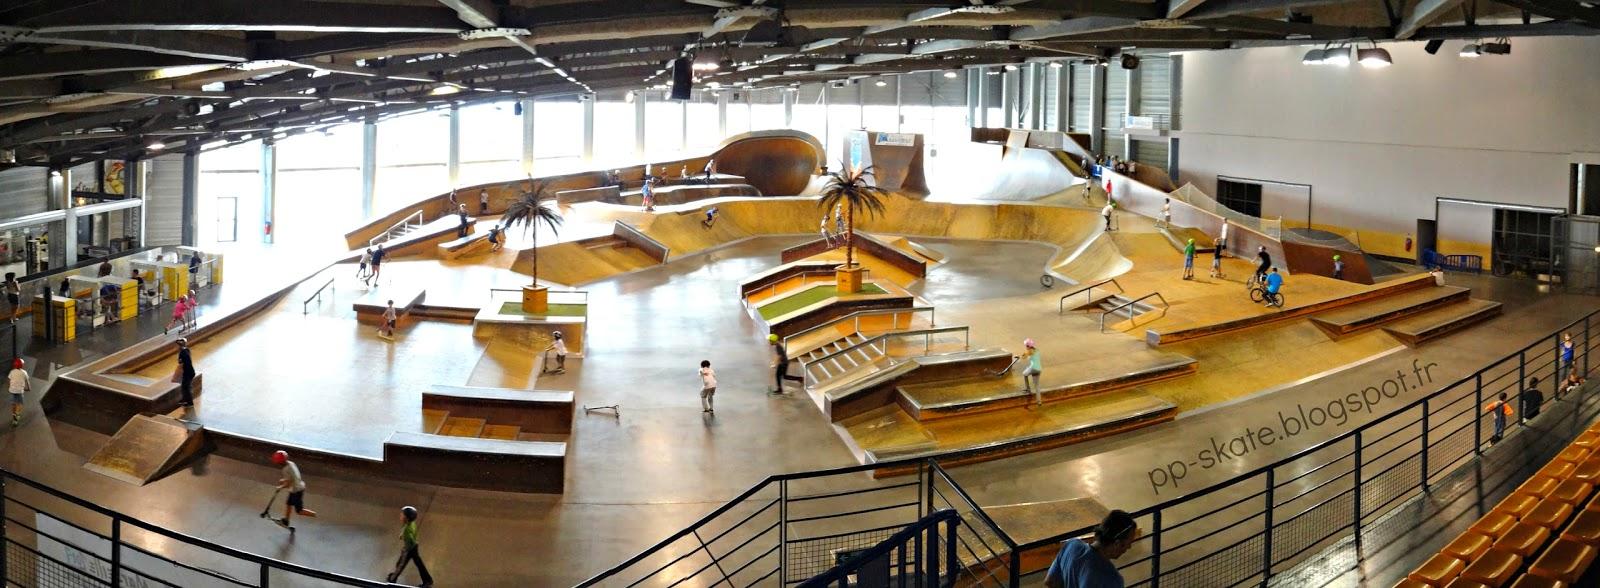 Skatepark palais omnisport marseille